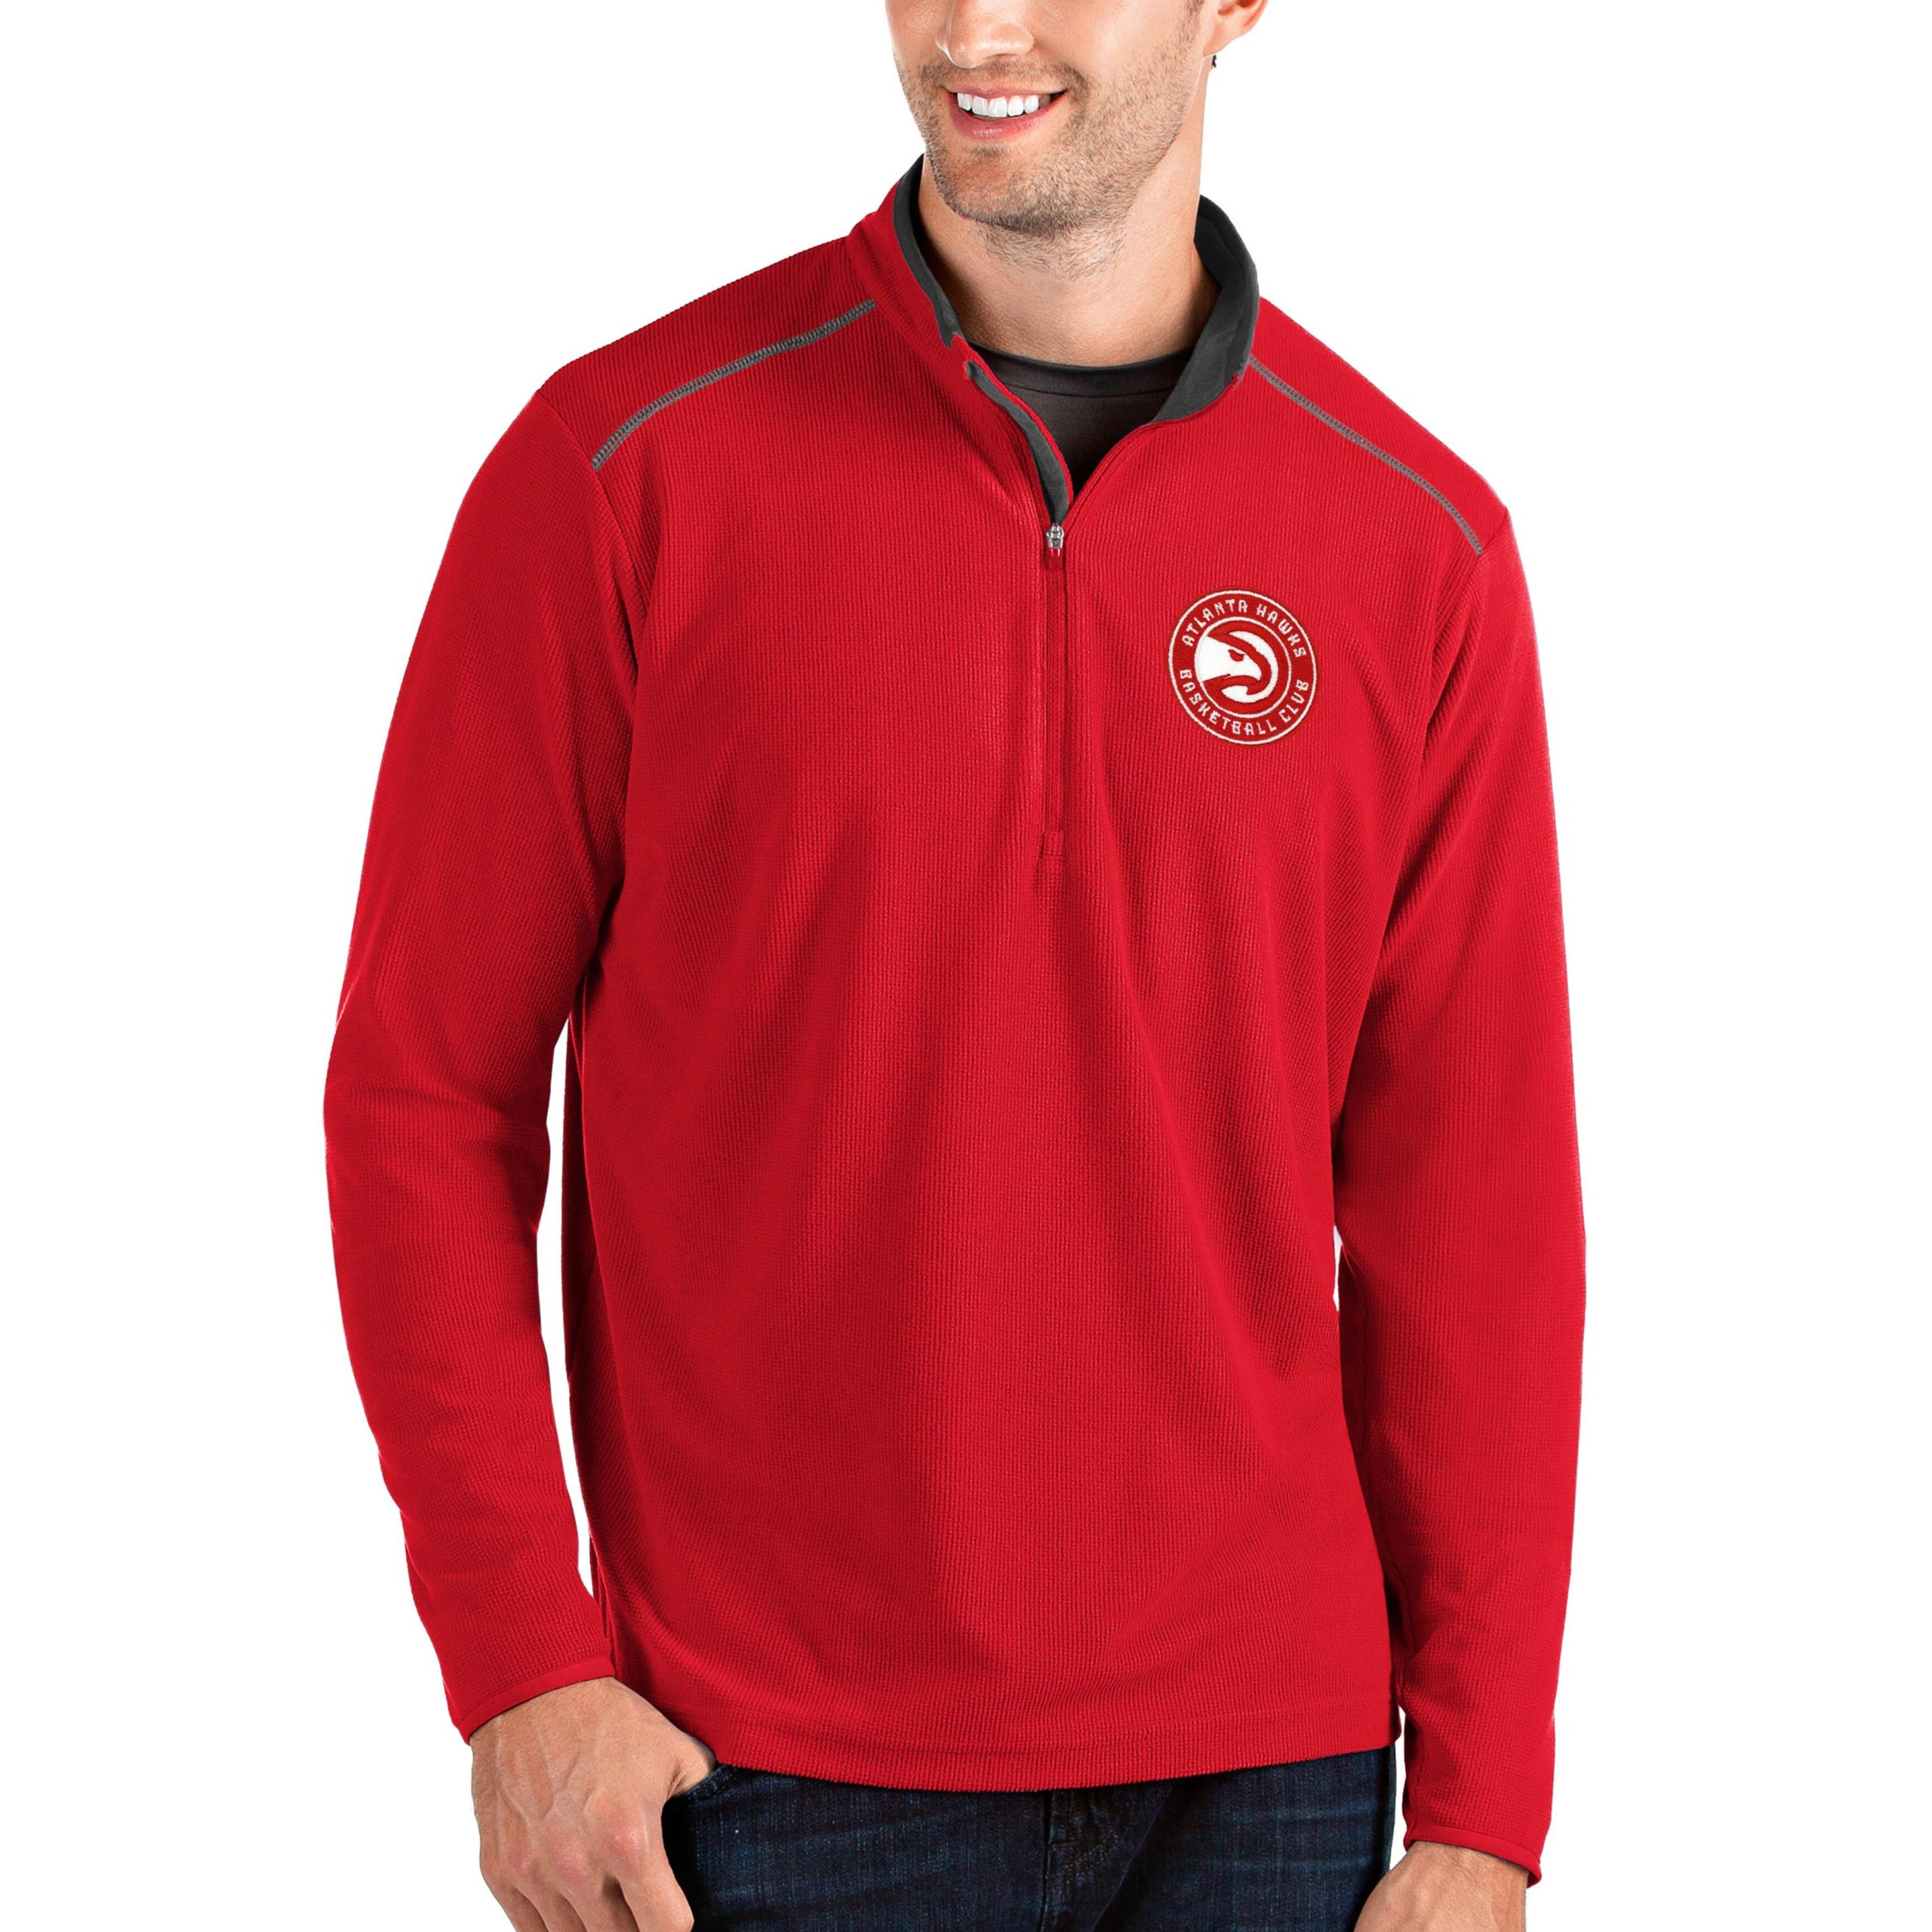 Atlanta Hawks Antigua Big & Tall Glacier Quarter-Zip Pullover Jacket - Red/Gray